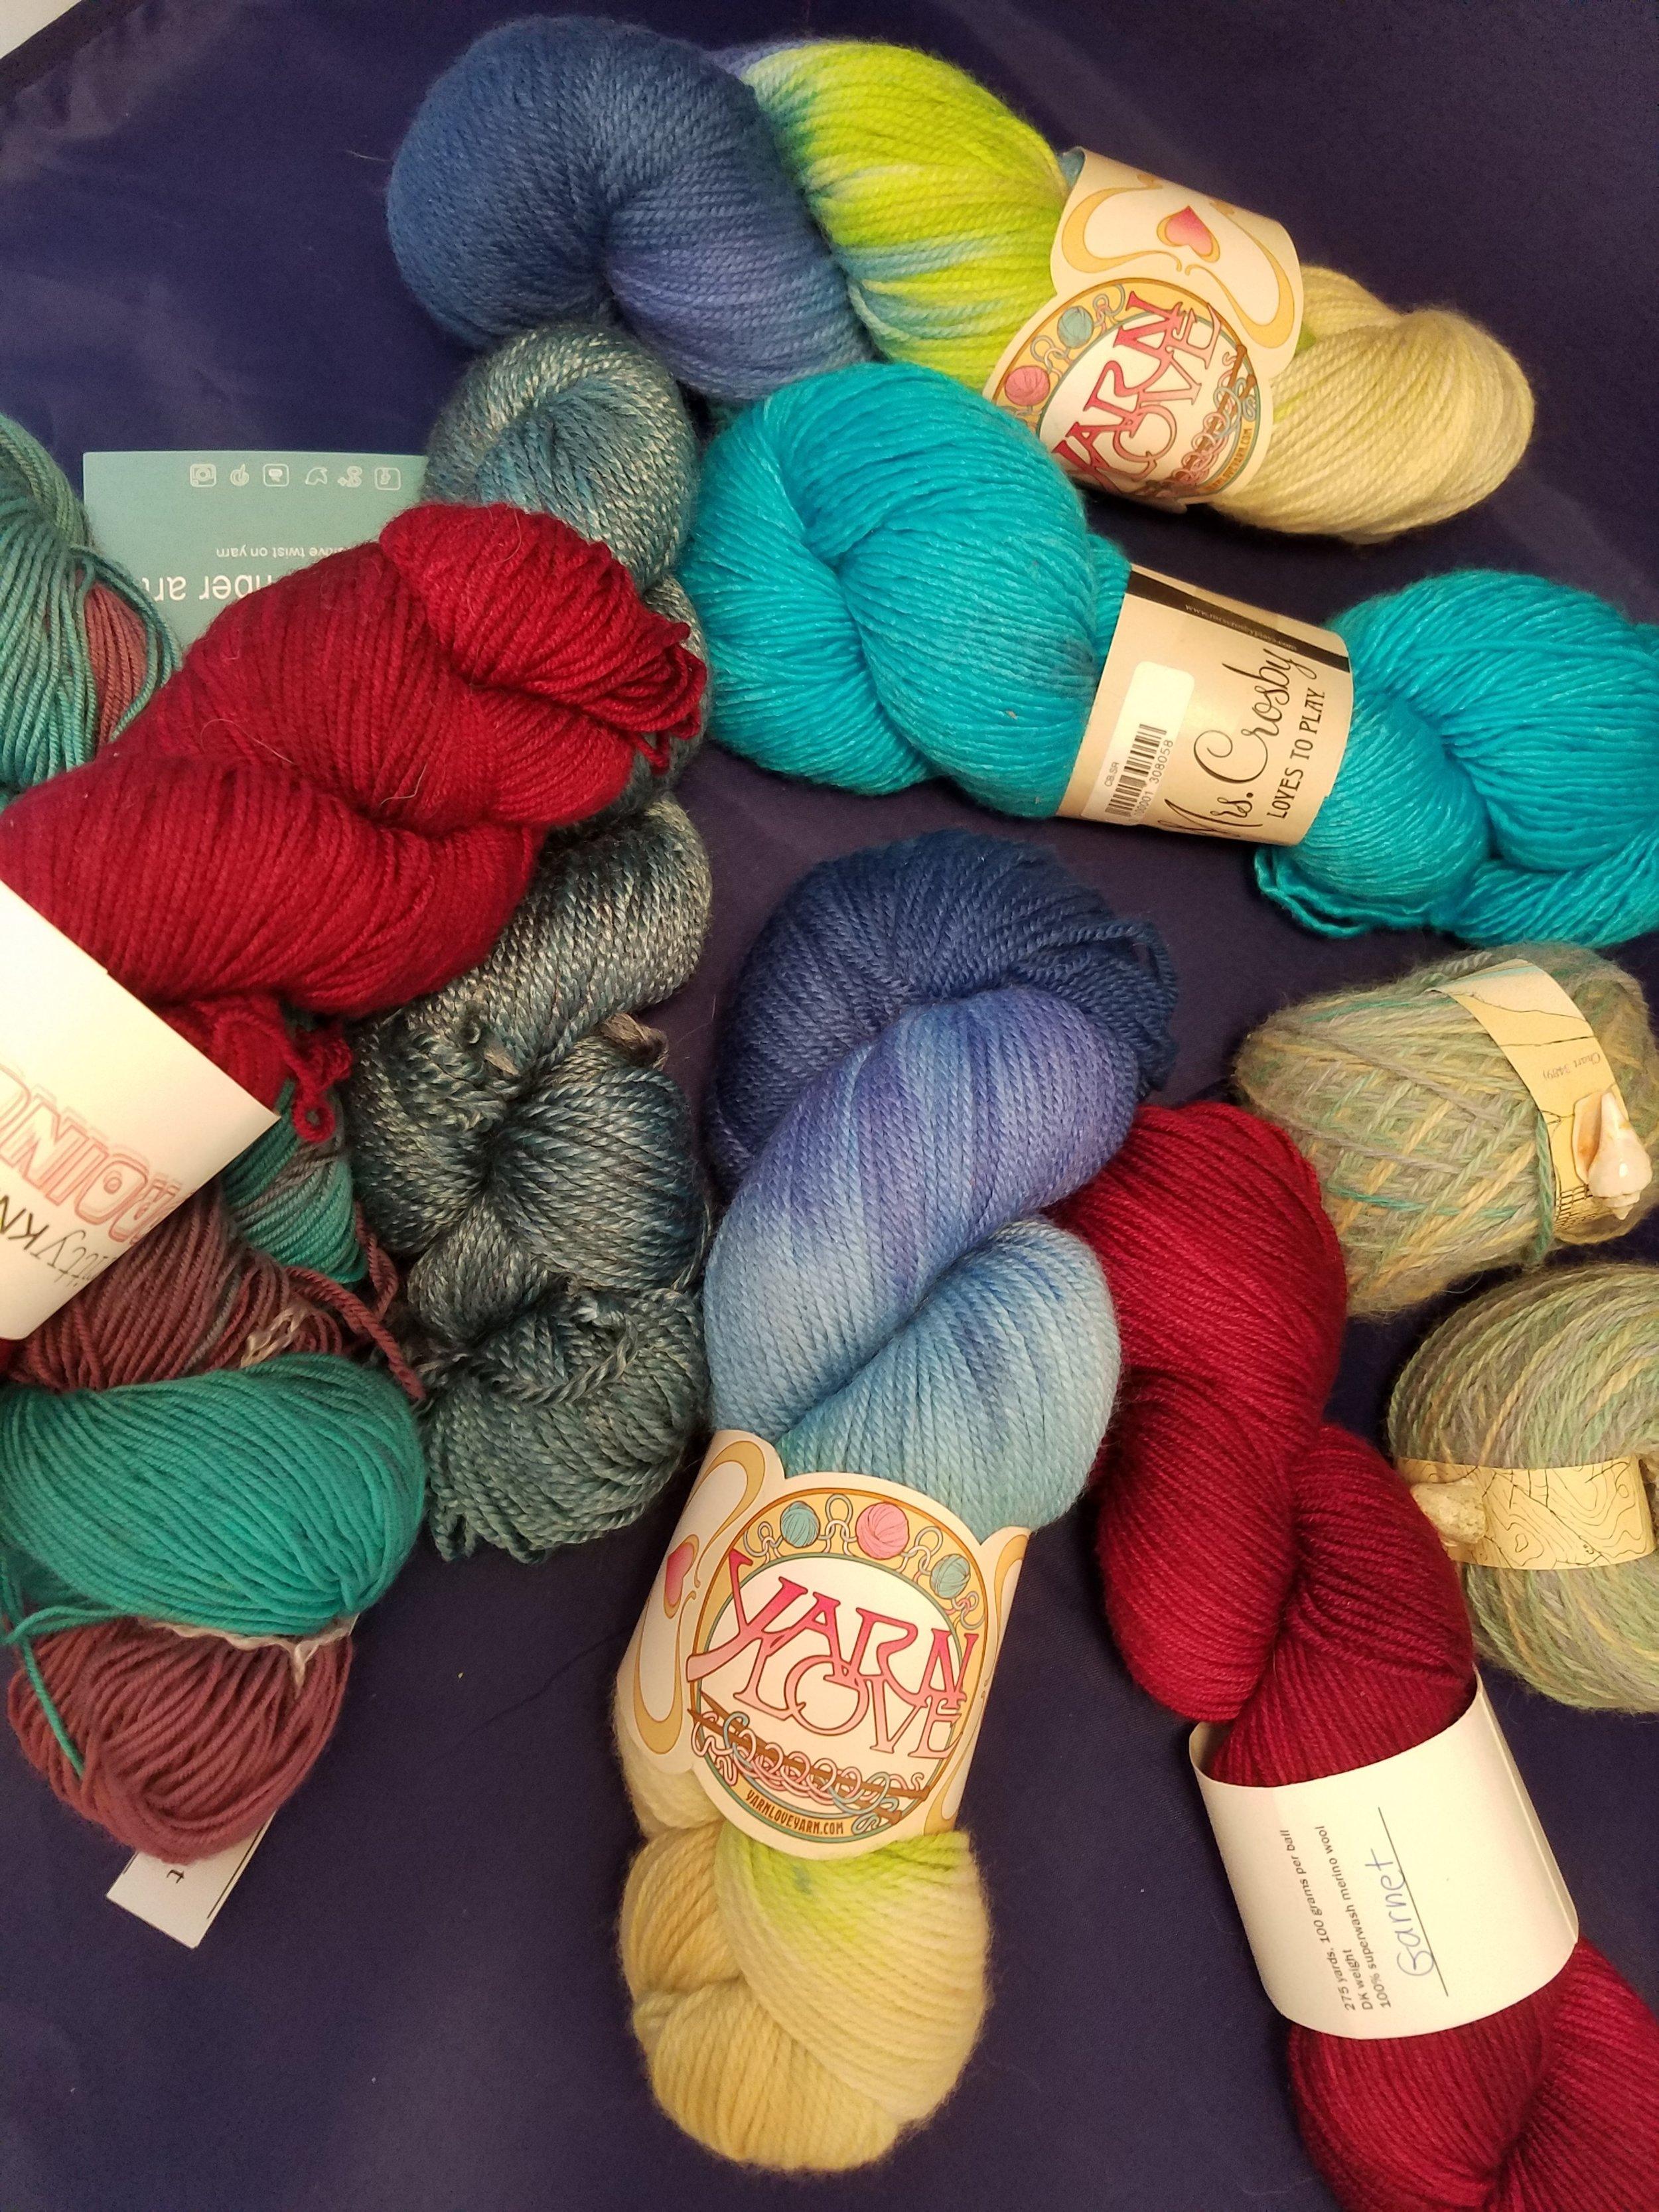 Some yarn, photographed in the light box. mmmmmmm